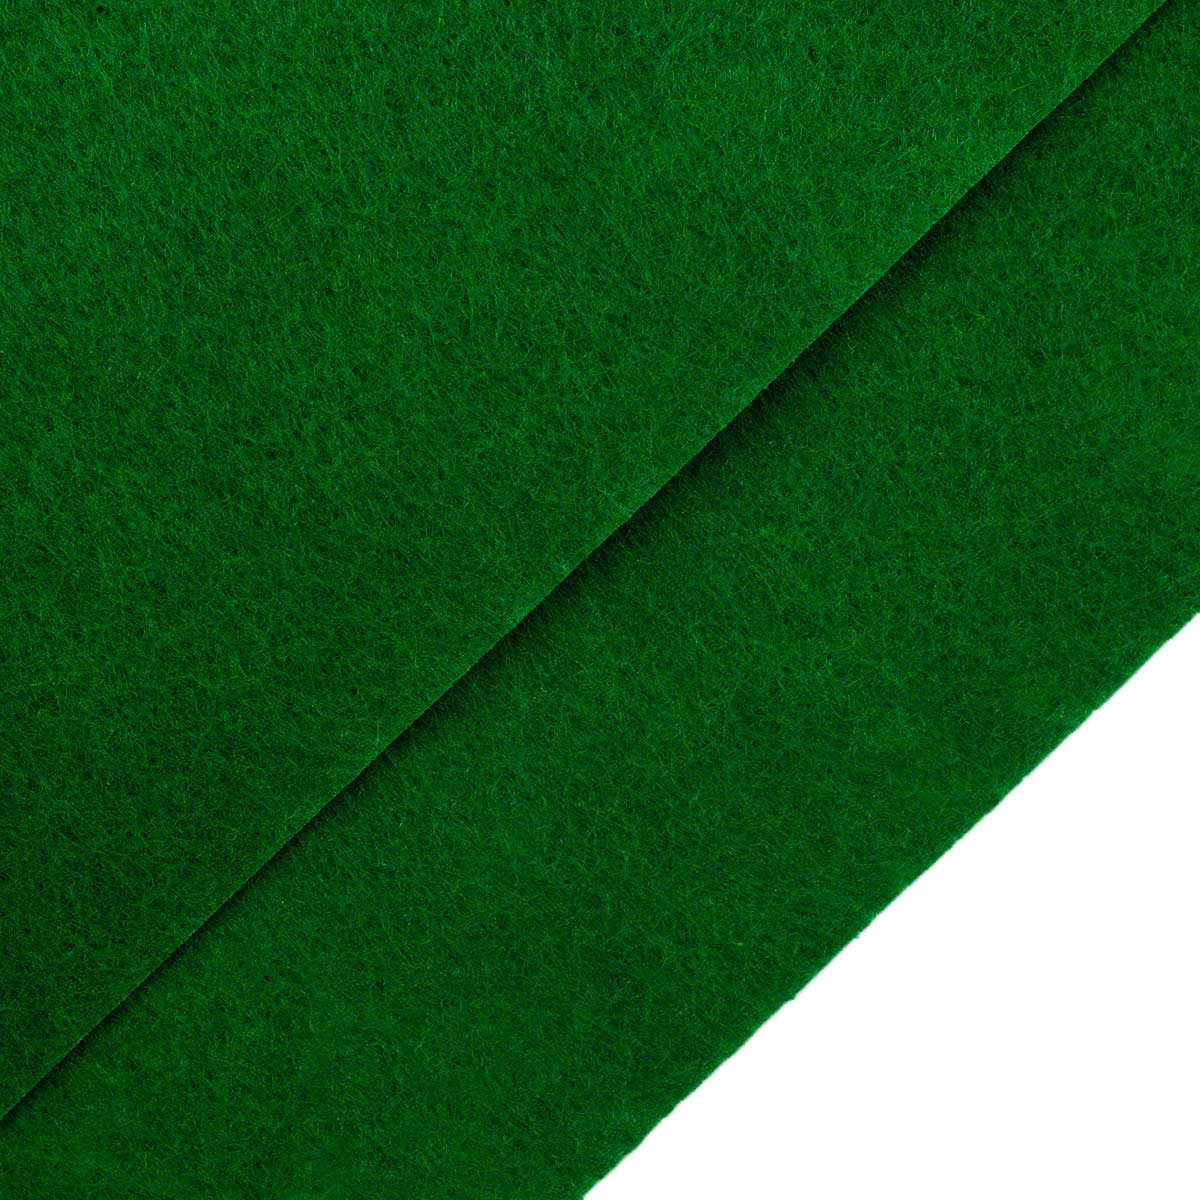 26959 Фетр жёсткий 1,0мм, 20*30 см, 100 % п/э, уп/2шт, зеленый